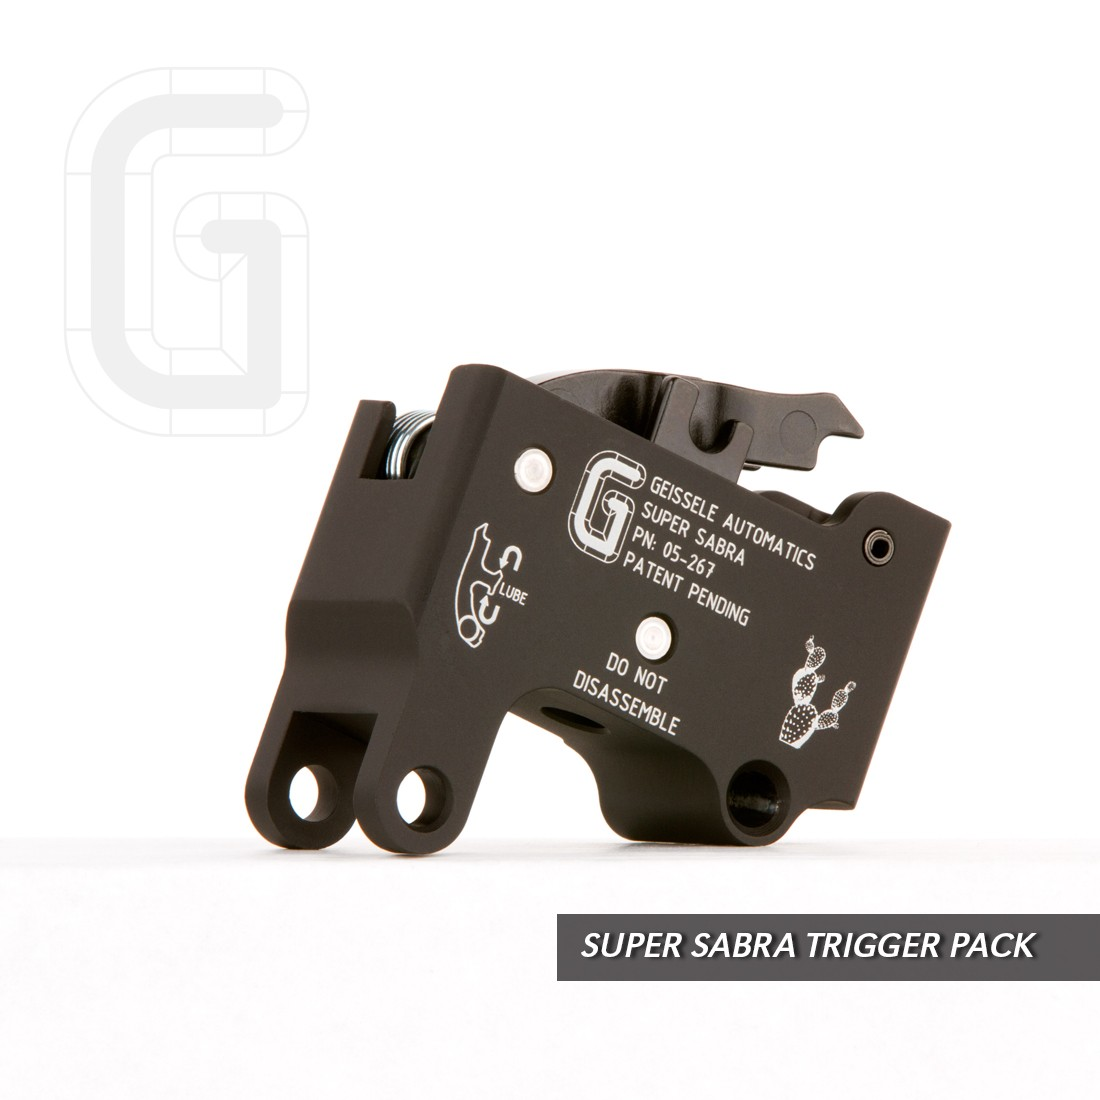 Geissele Super Sabra Trigger Pack (IWI Tavor) Gen. 2